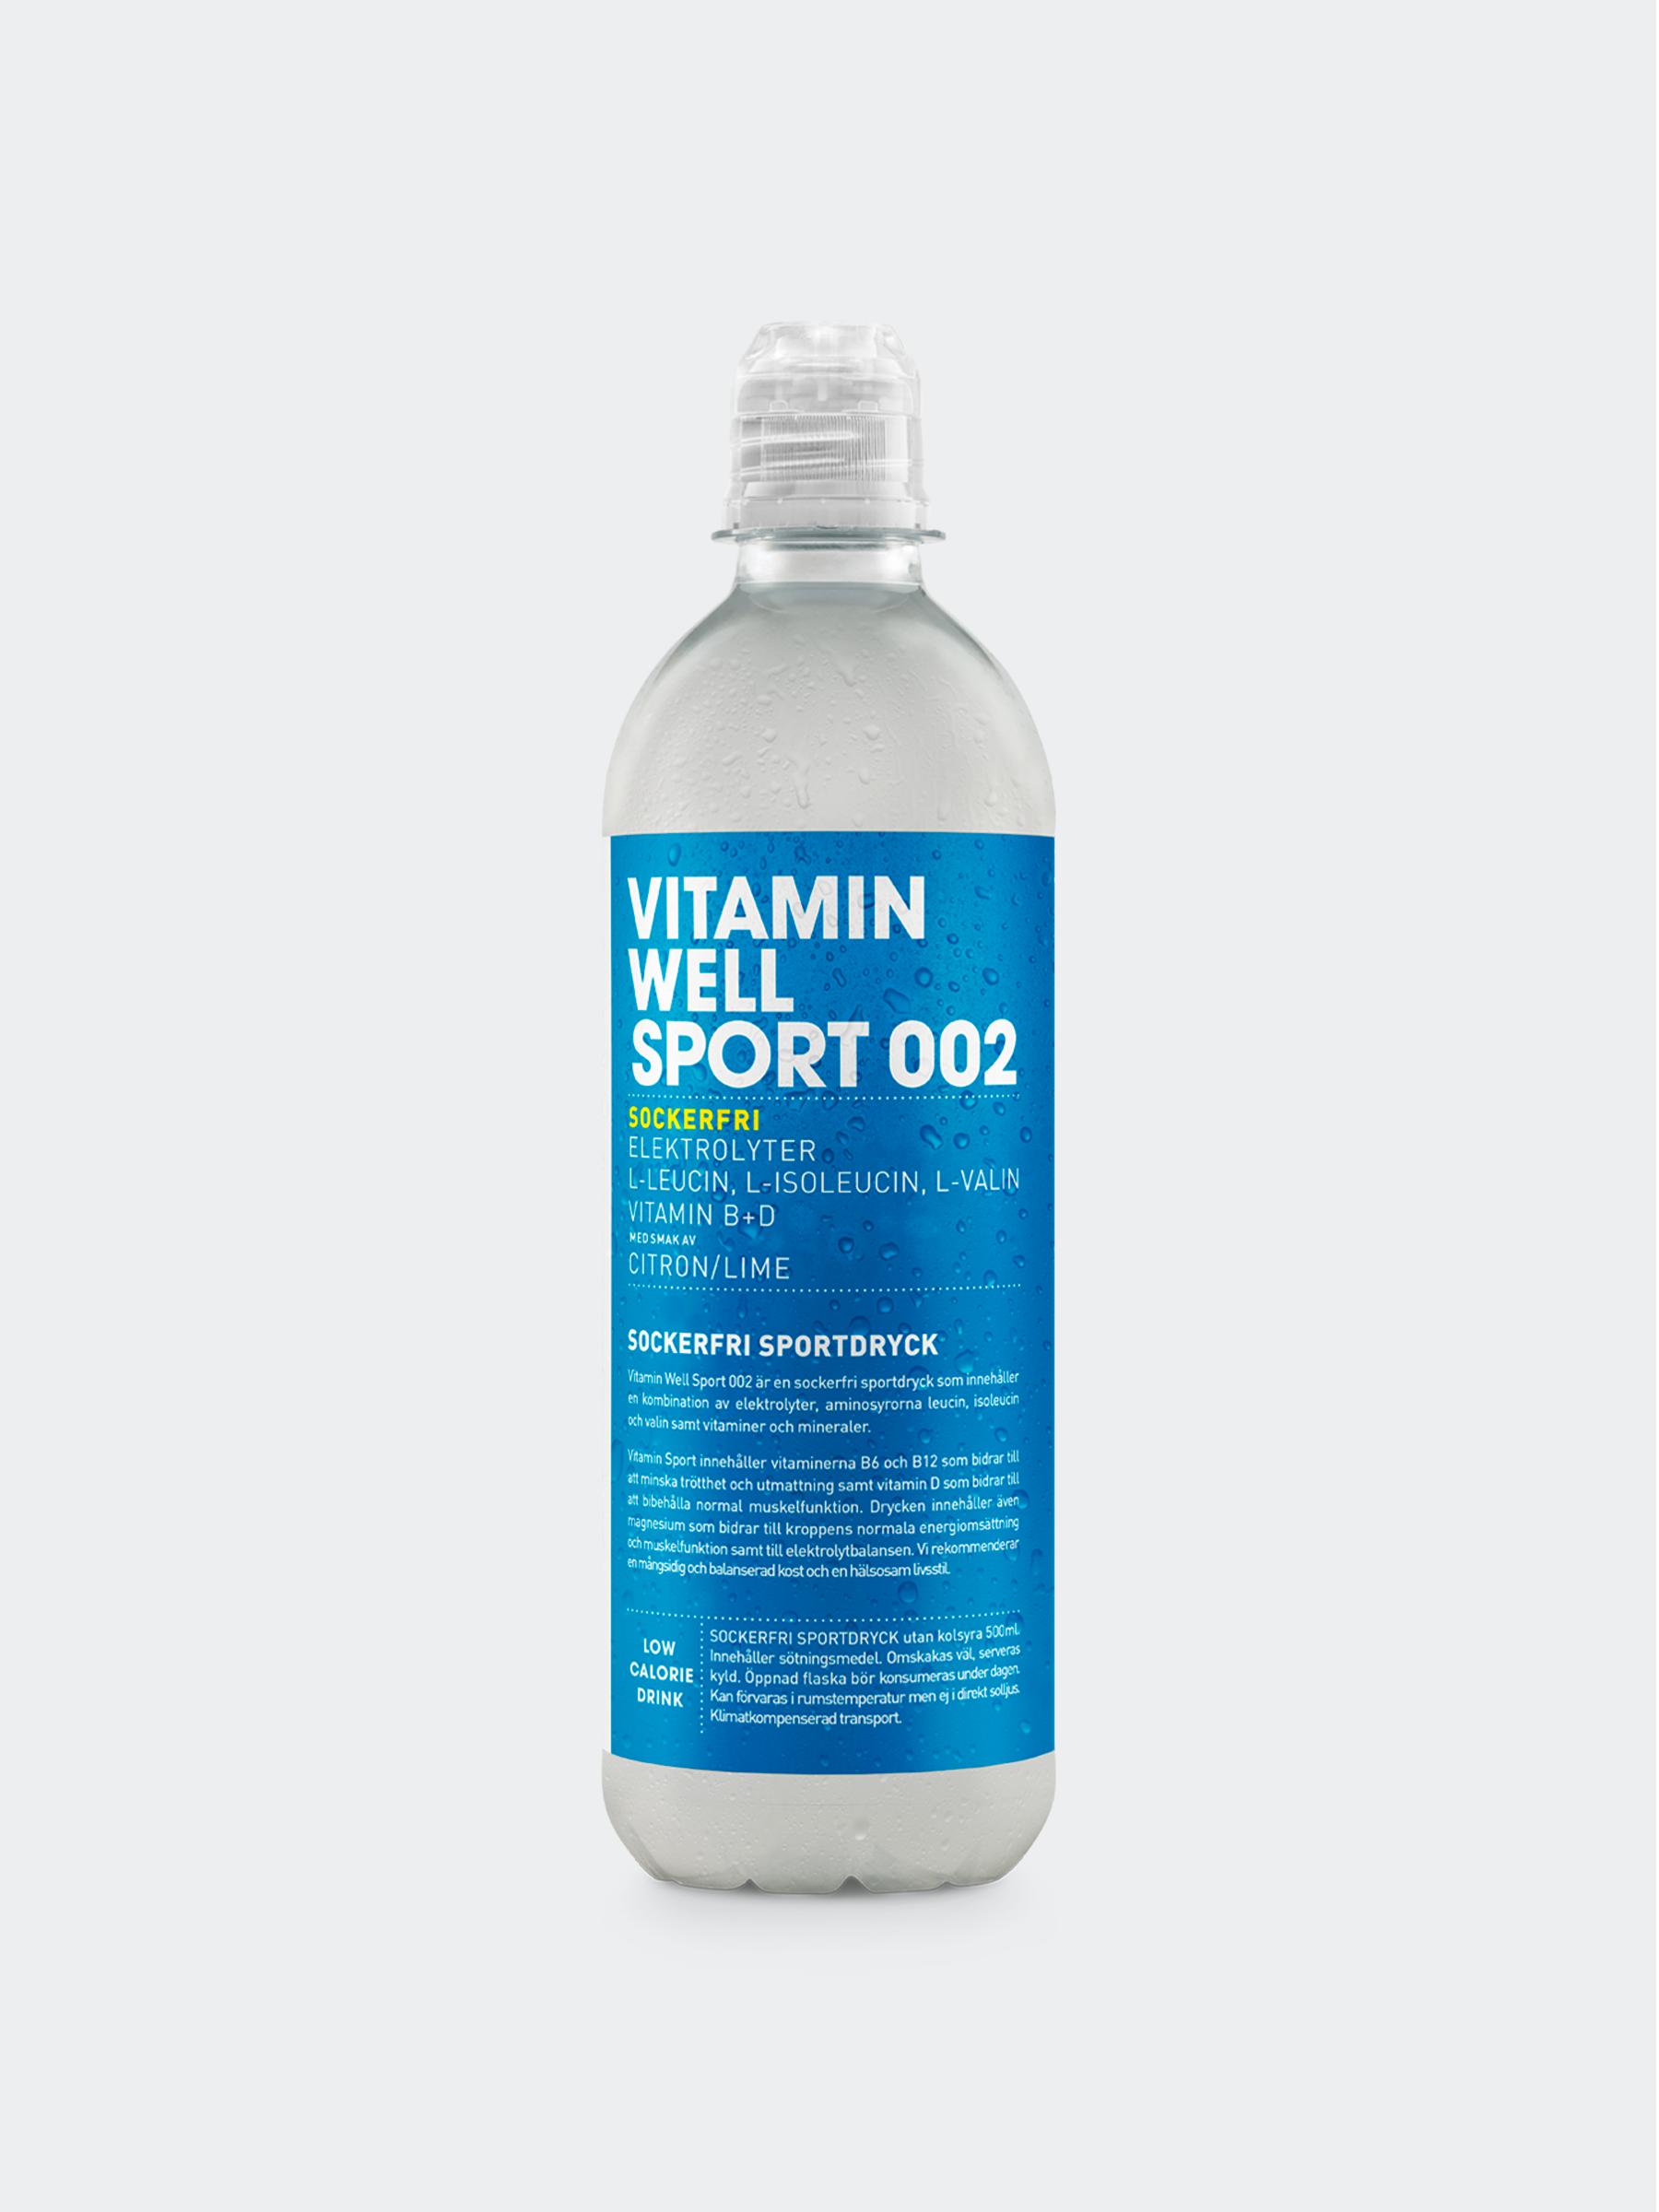 Vitamin Well Sport 002 Styck